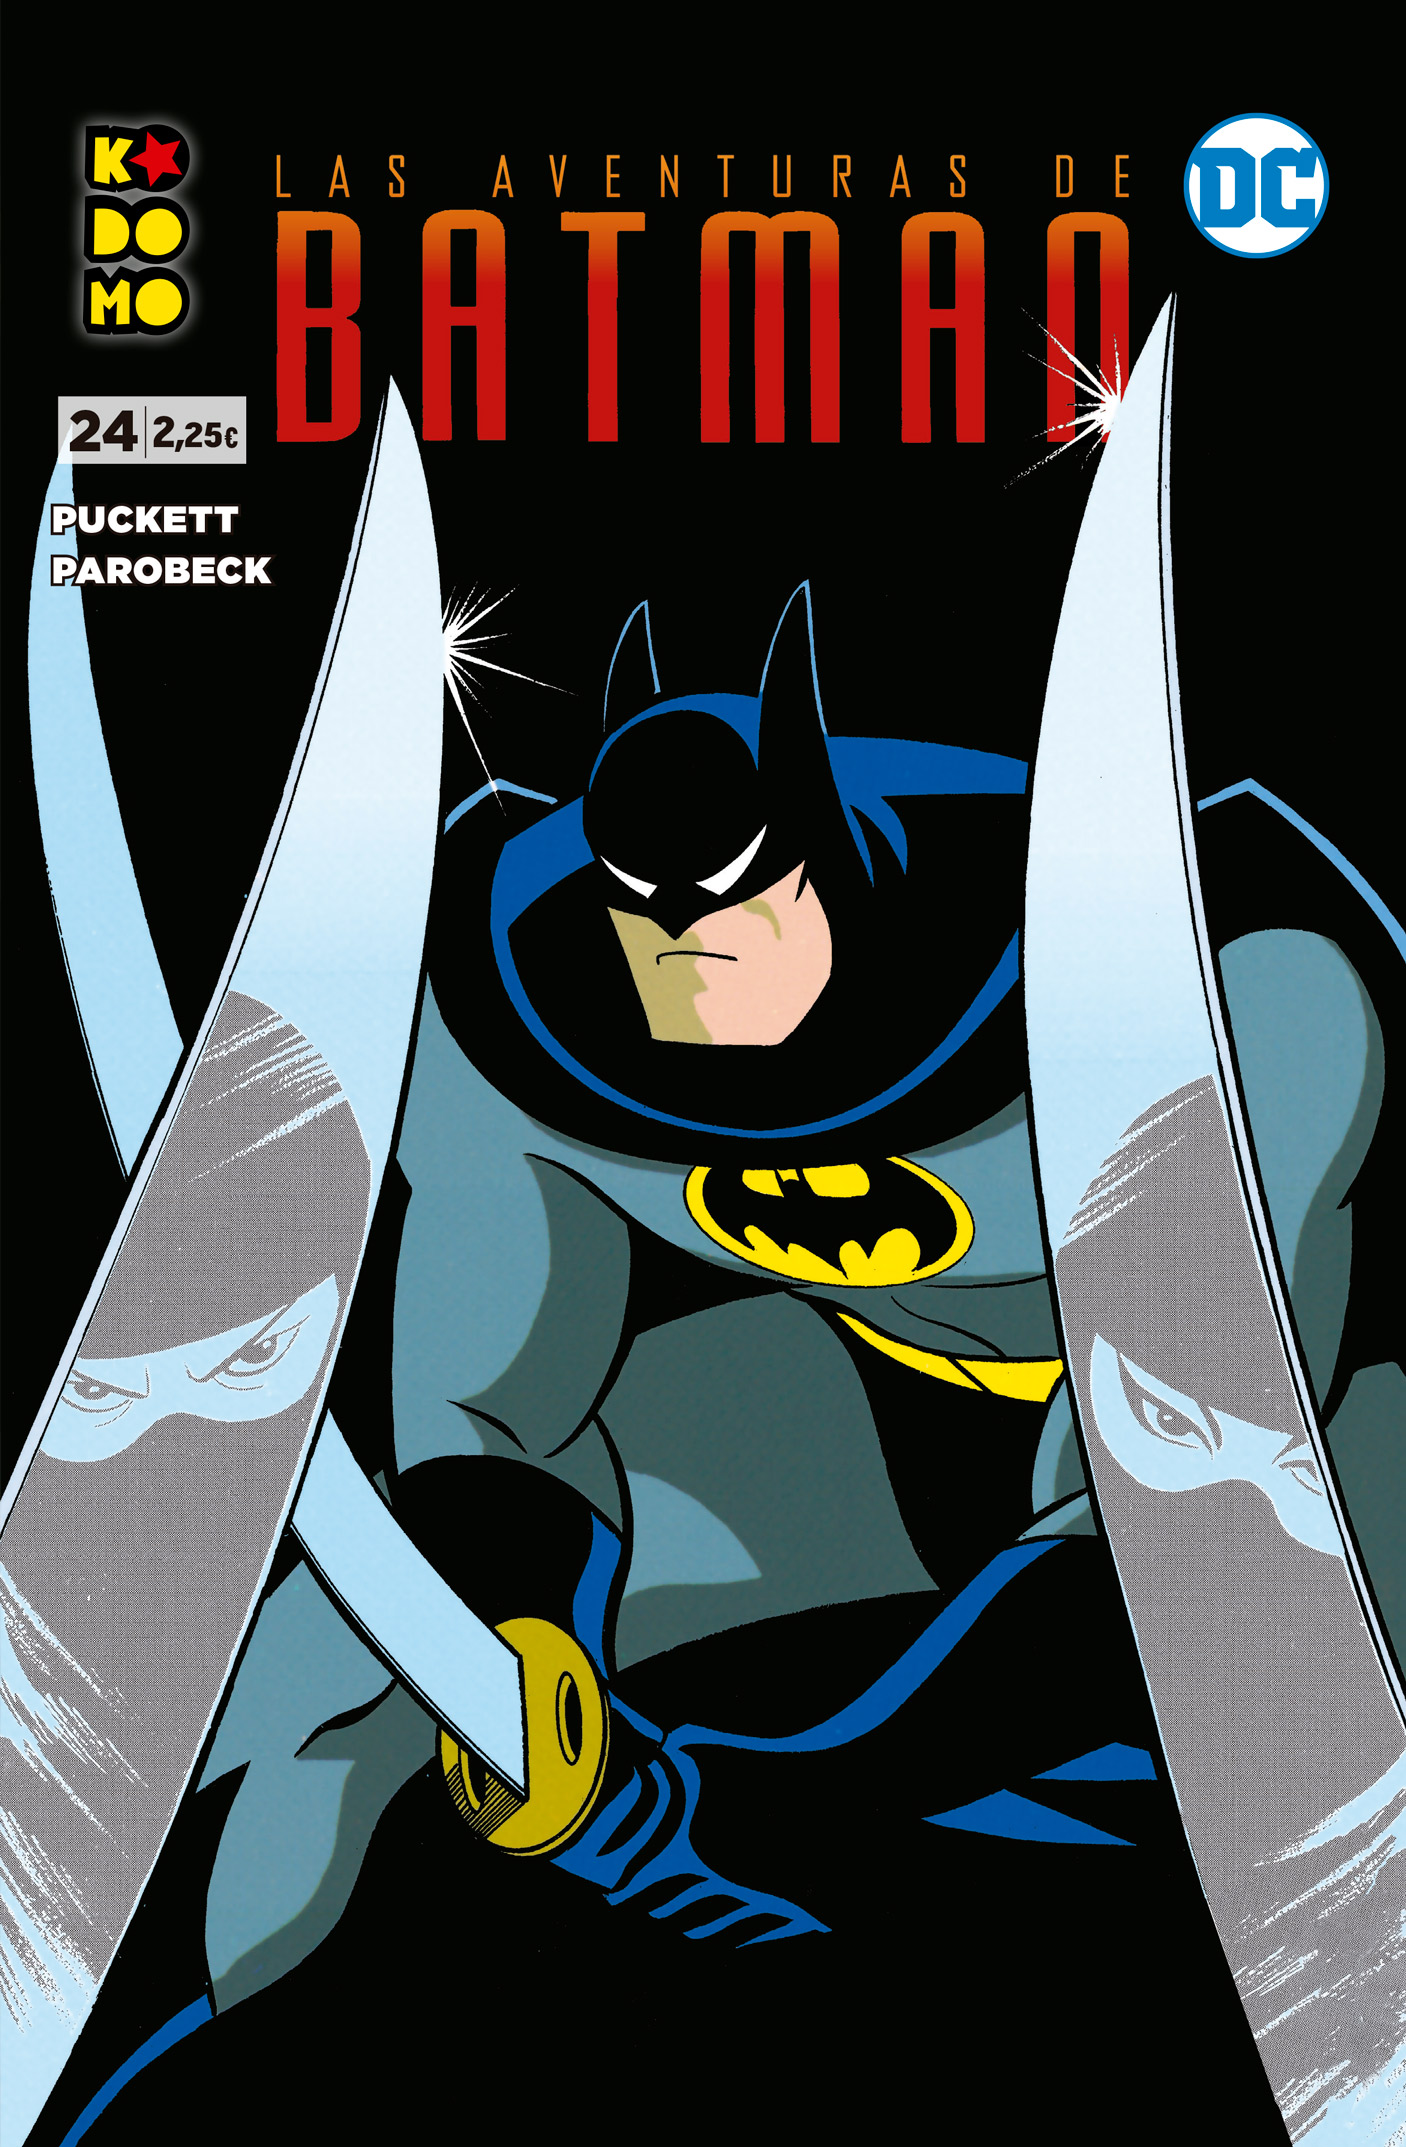 Las aventuras de Batman núm. 24